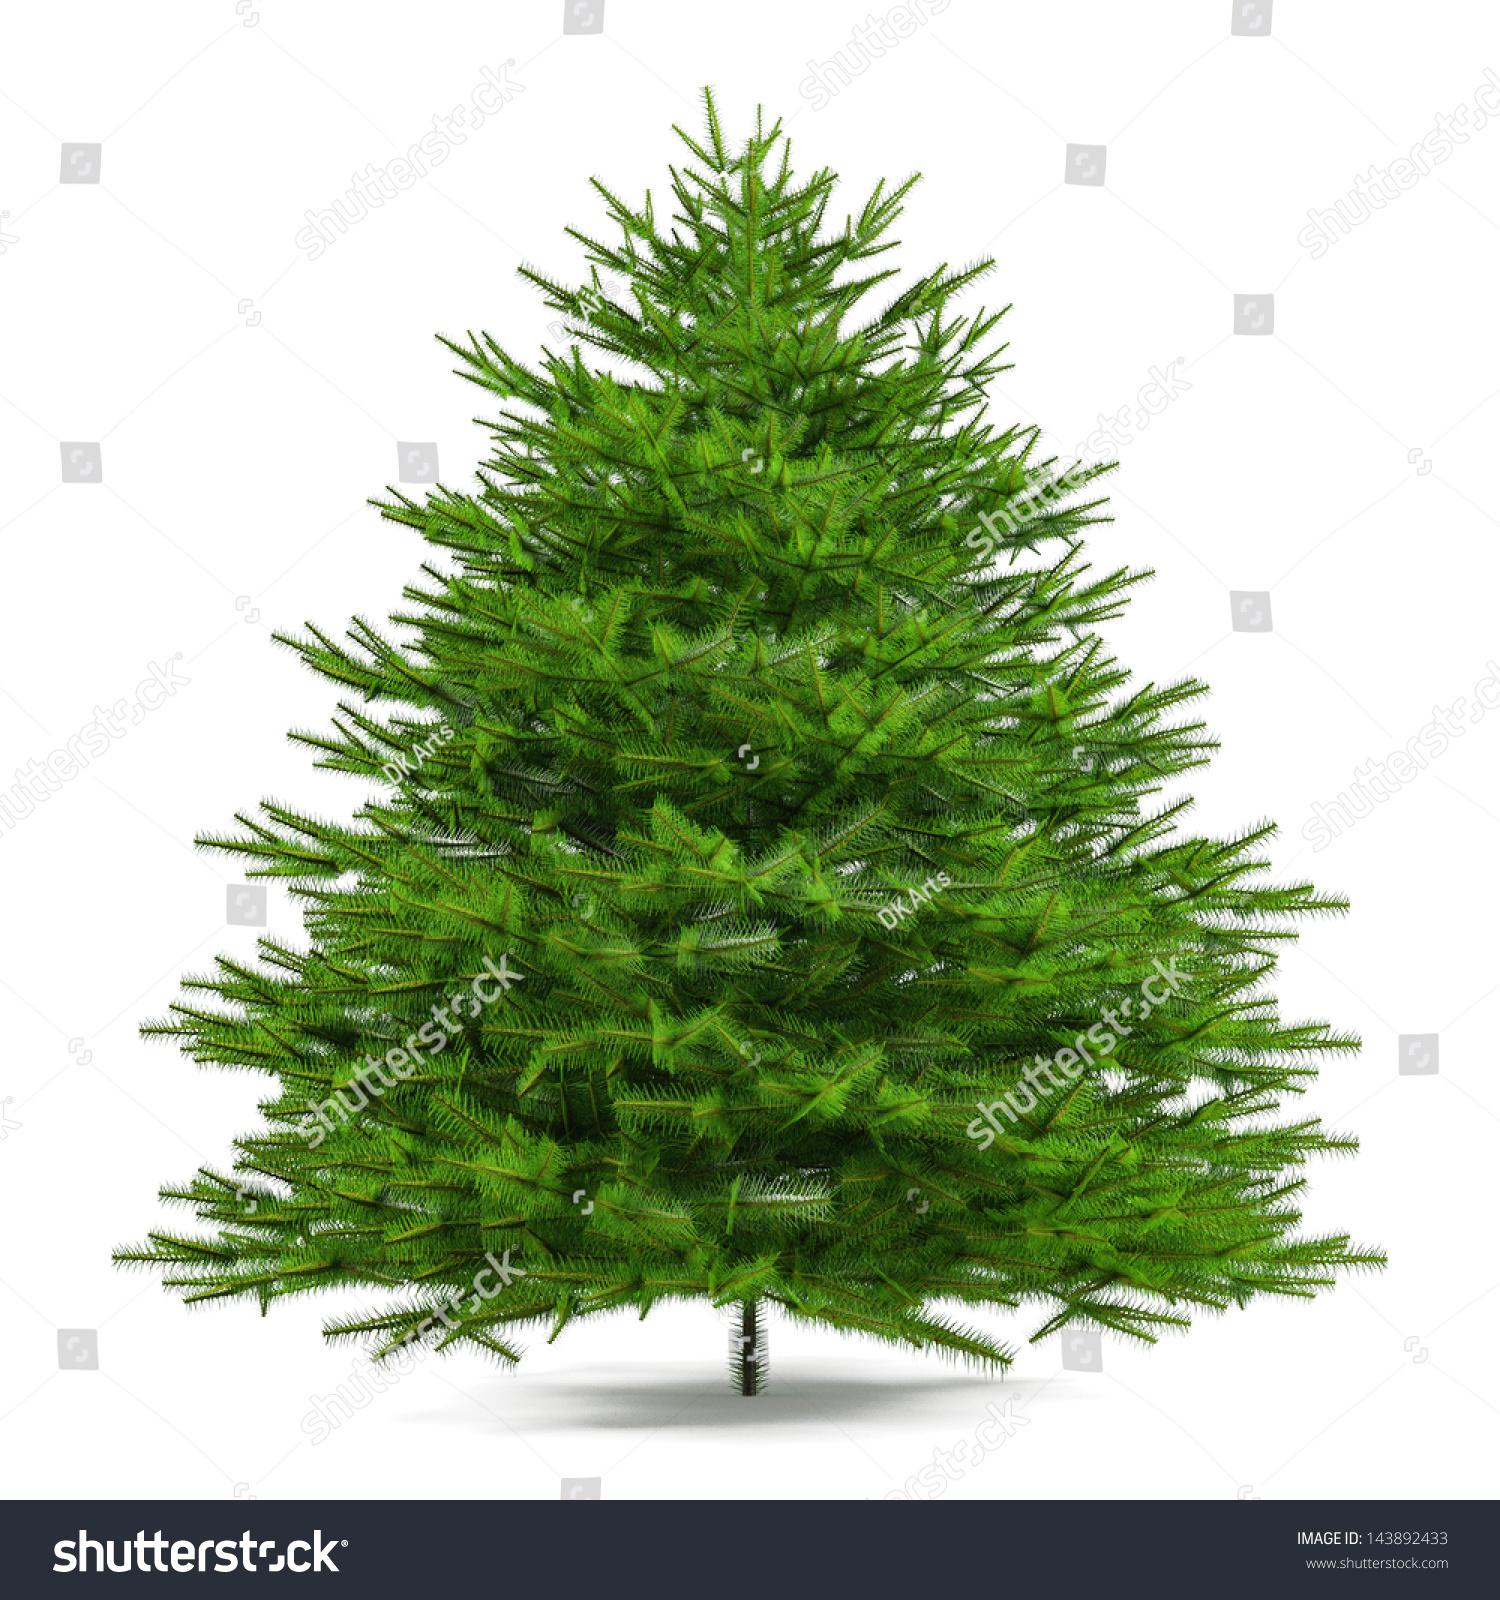 Pine tree isolated. Abies firma #143892433